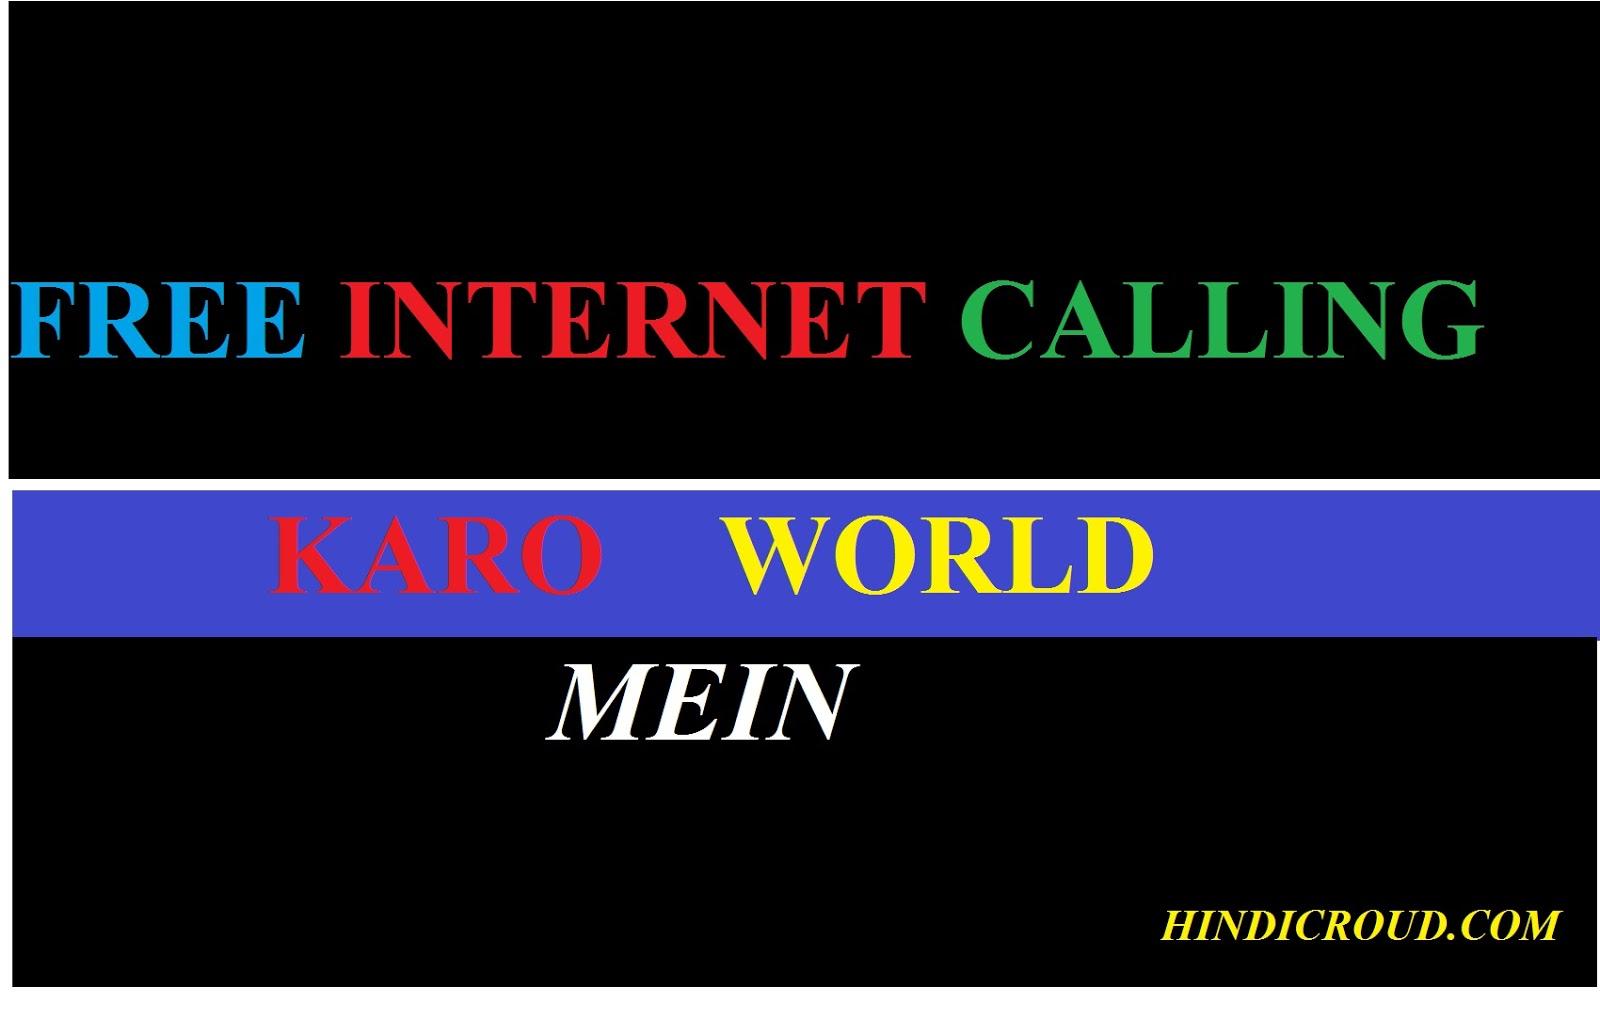 Free Internet Calling